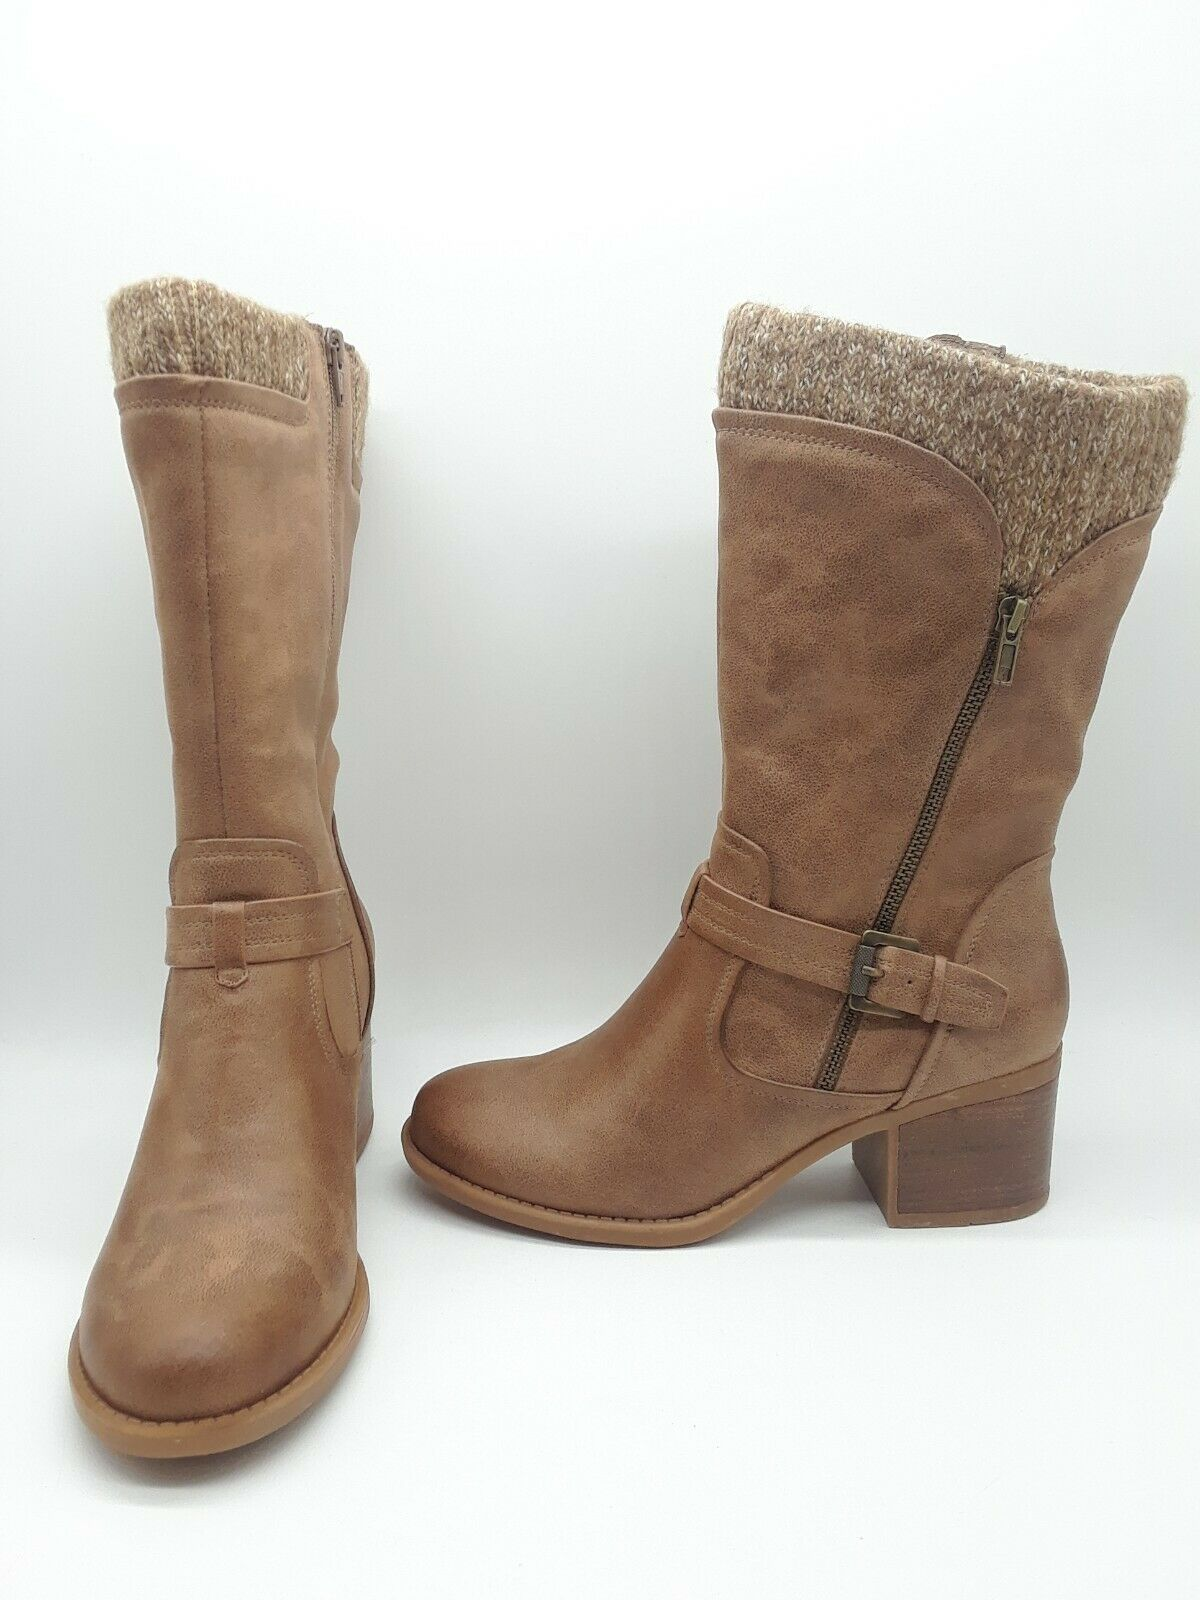 Baretraps Weslin Women shoes Block-Heel Motorcycle Boots Taupe Sz 8 M